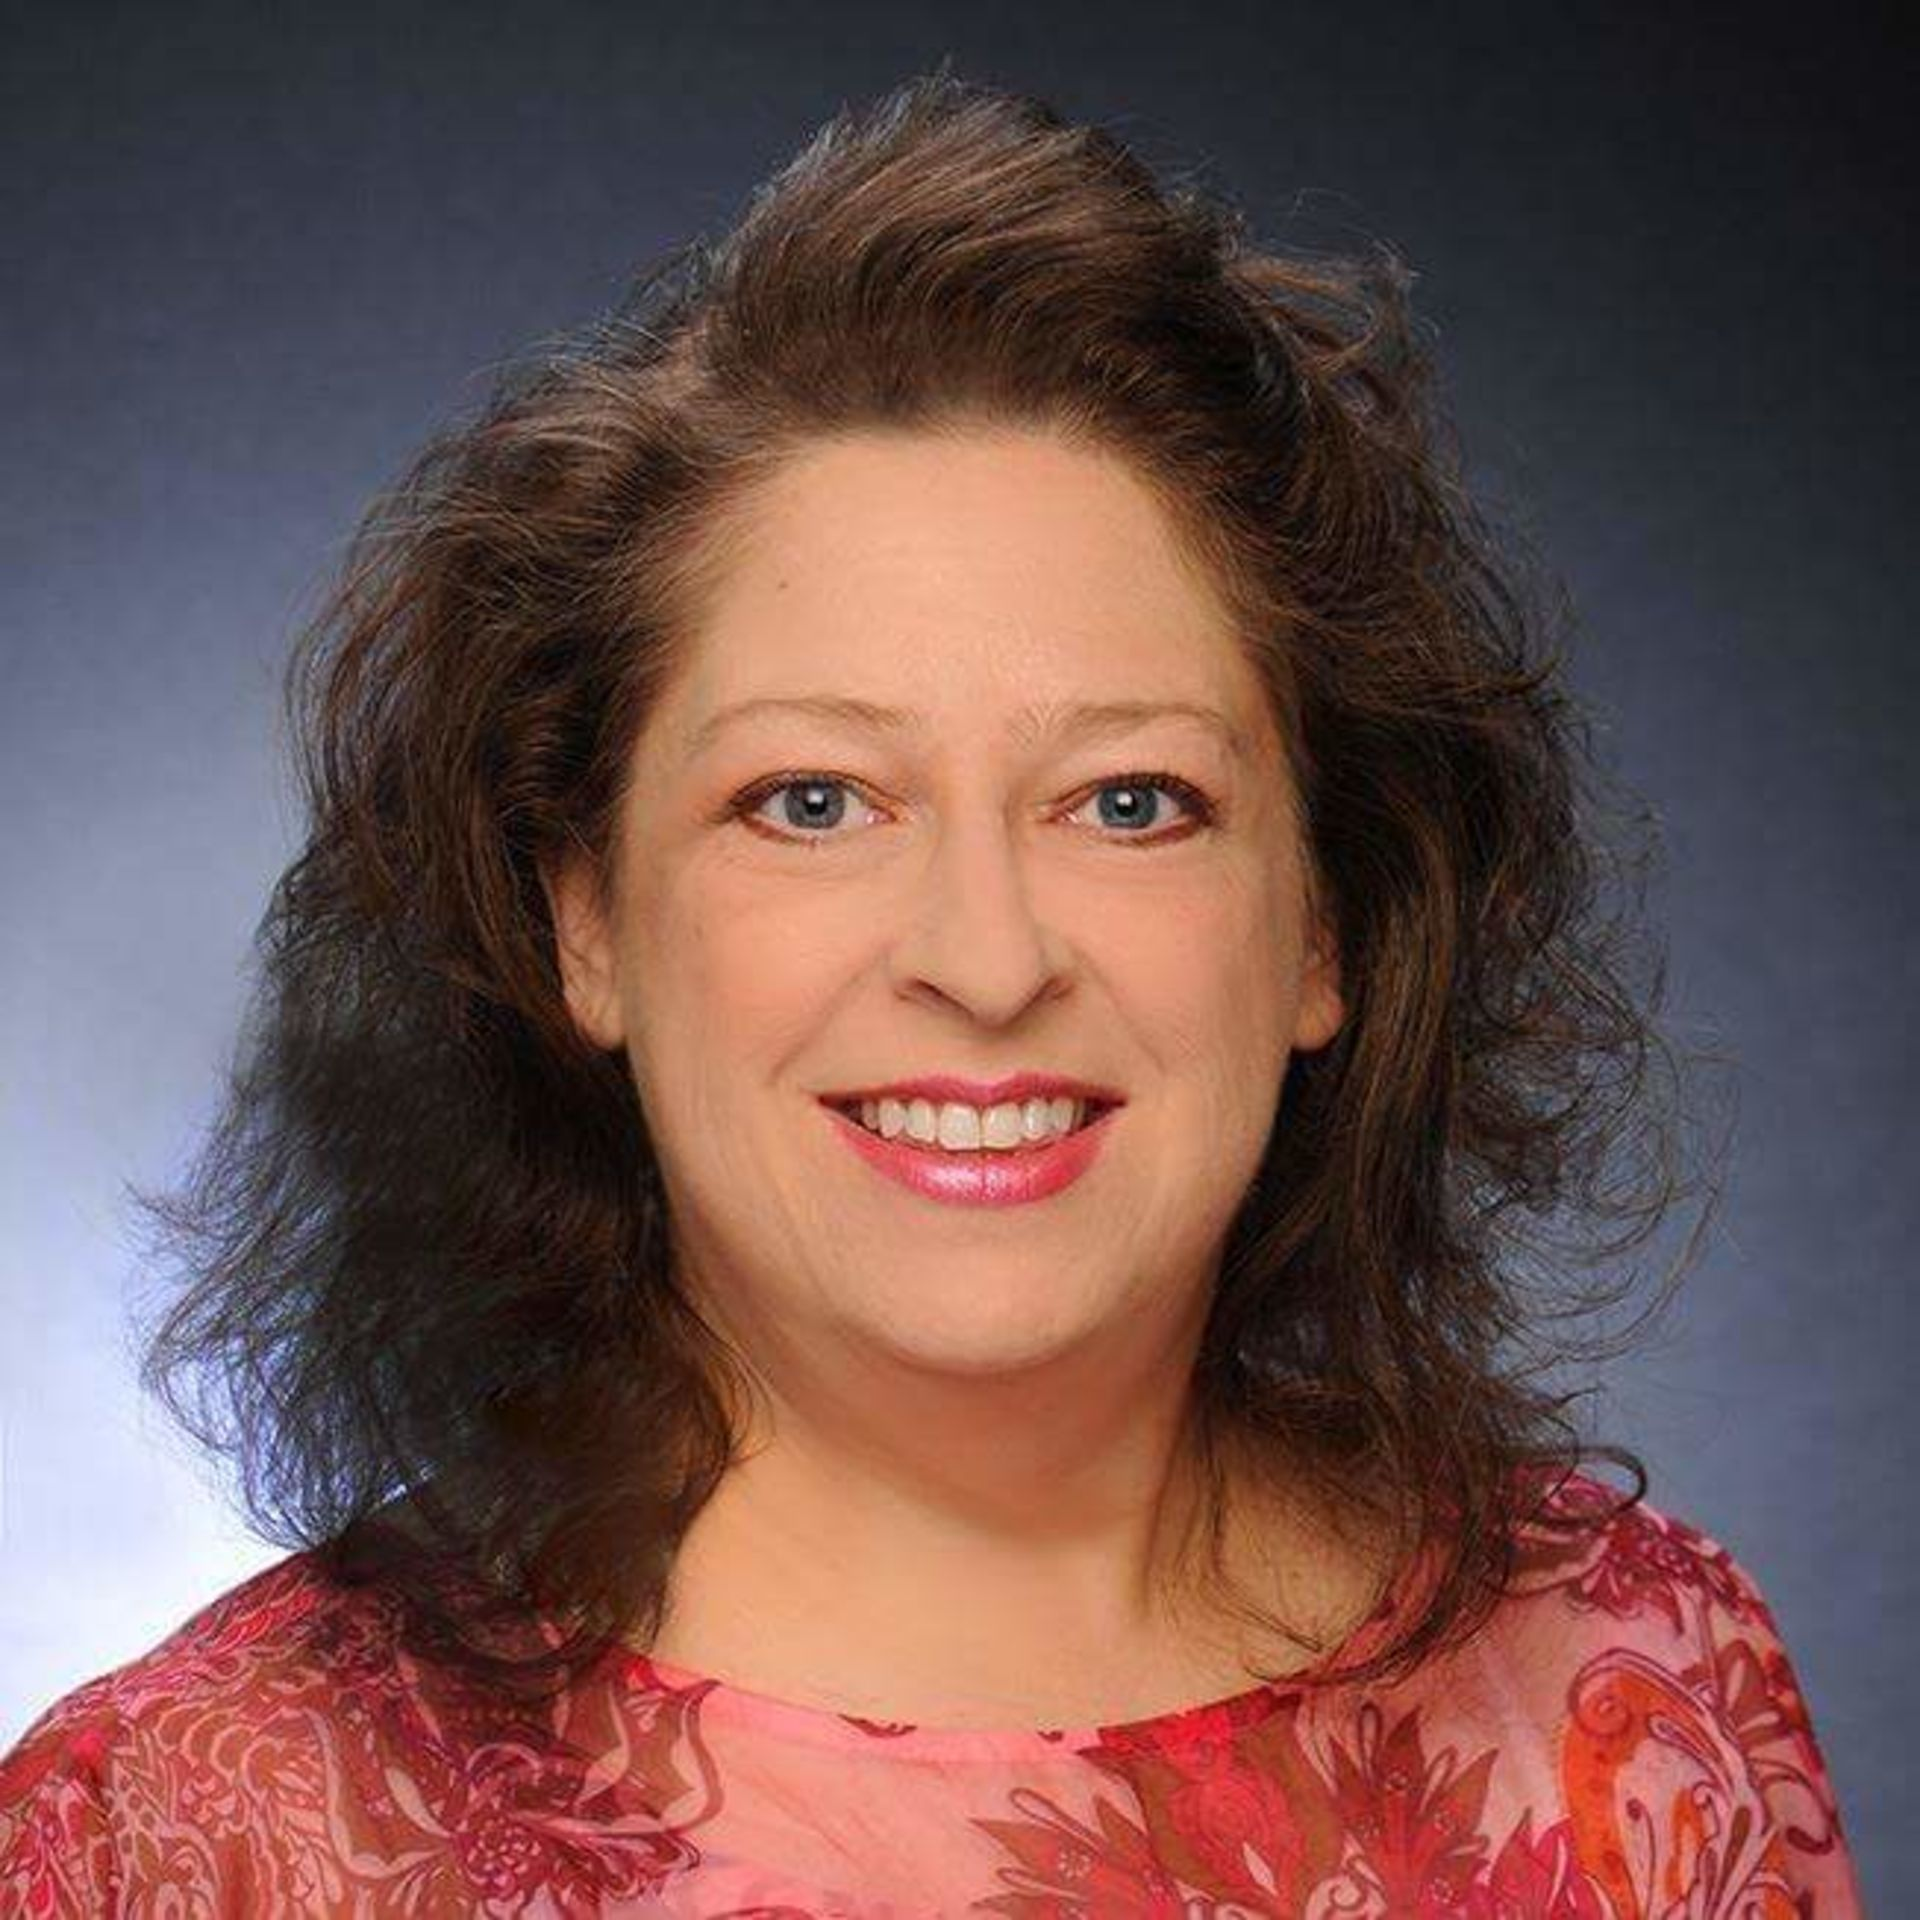 Lyn O'Neal